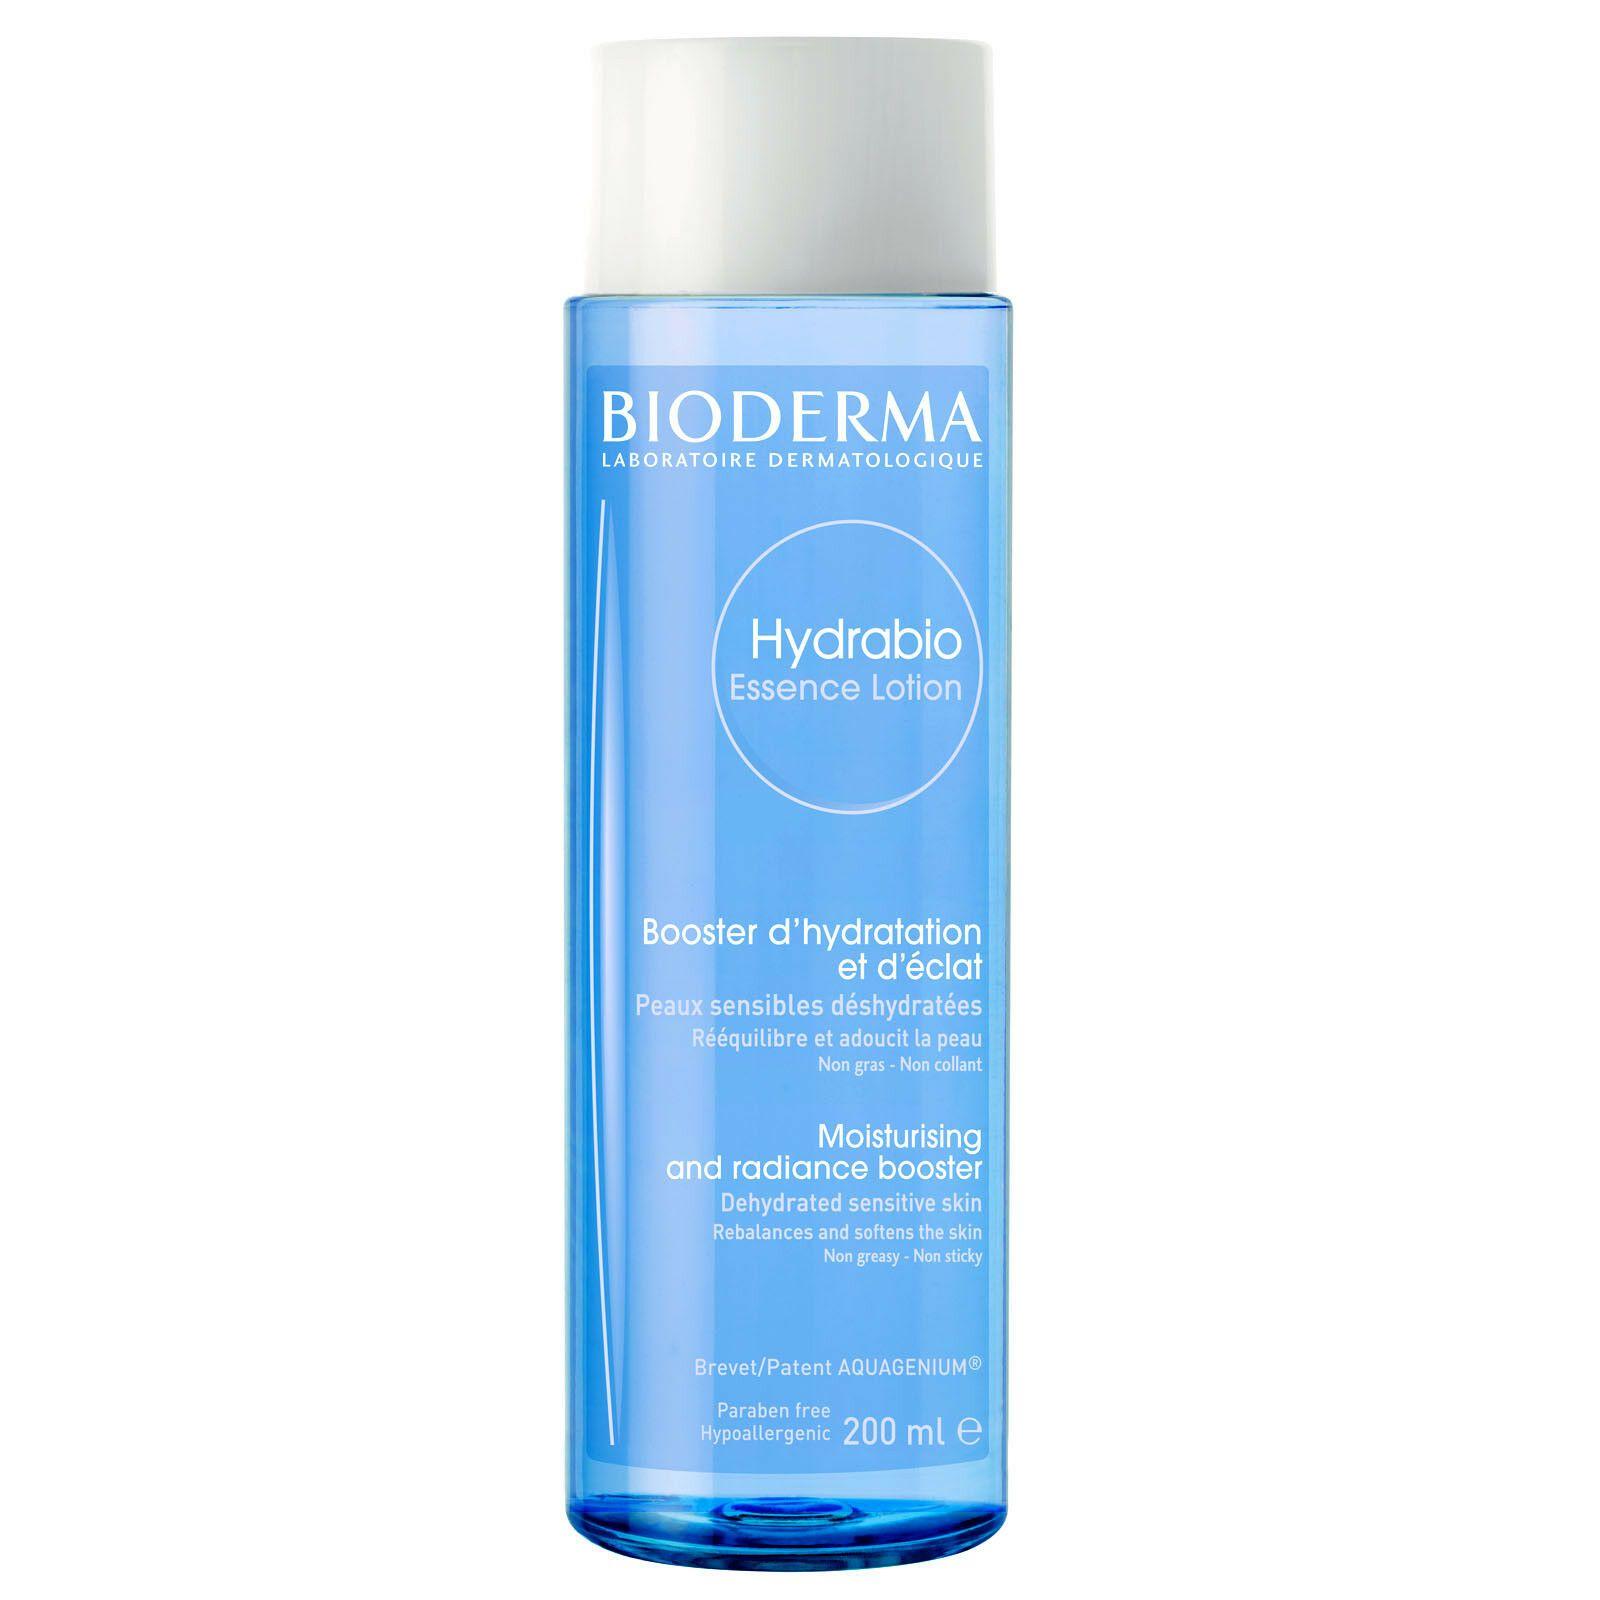 Bioderma Hydrabio Essence Lotion 200ml Watery Skin Boosting